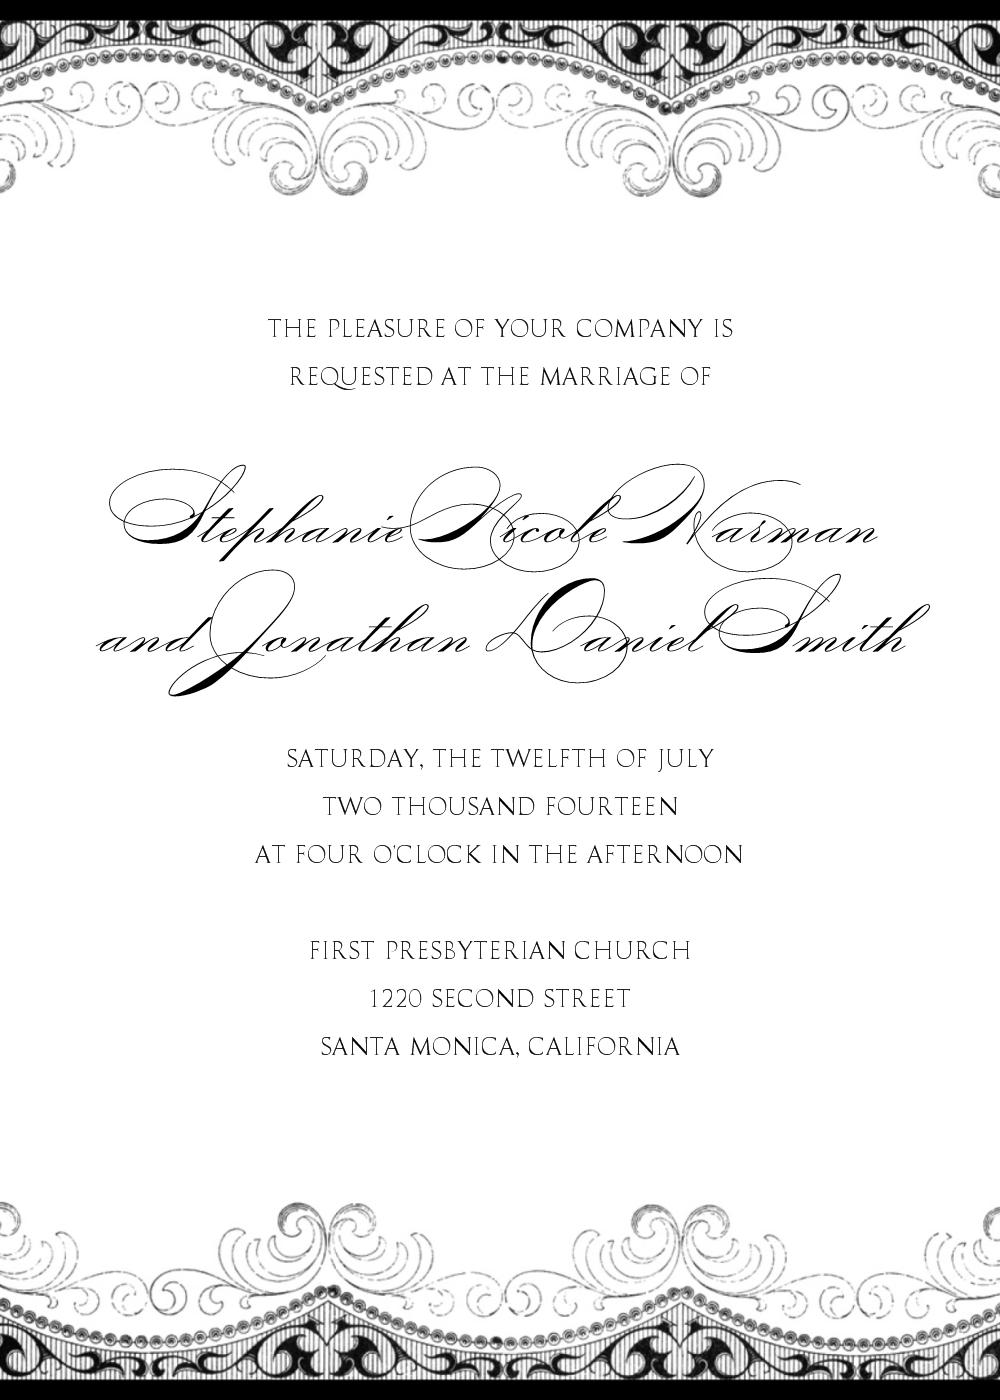 Free Wedding Invitation Wording In Spanish